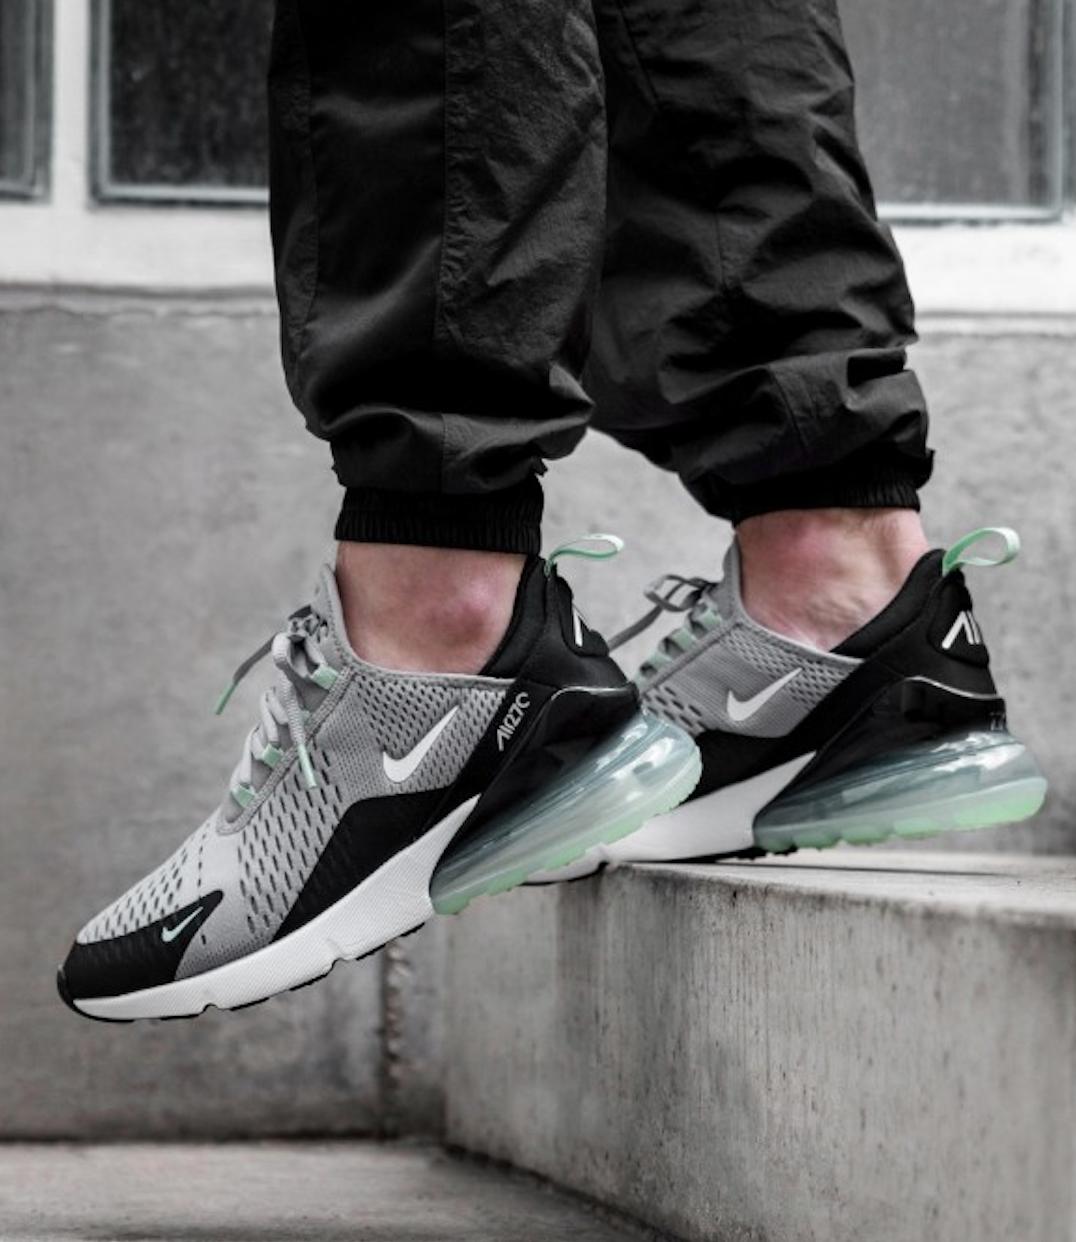 Nike Air Max 270 Grey Green Sneakers in 2020 | Mint